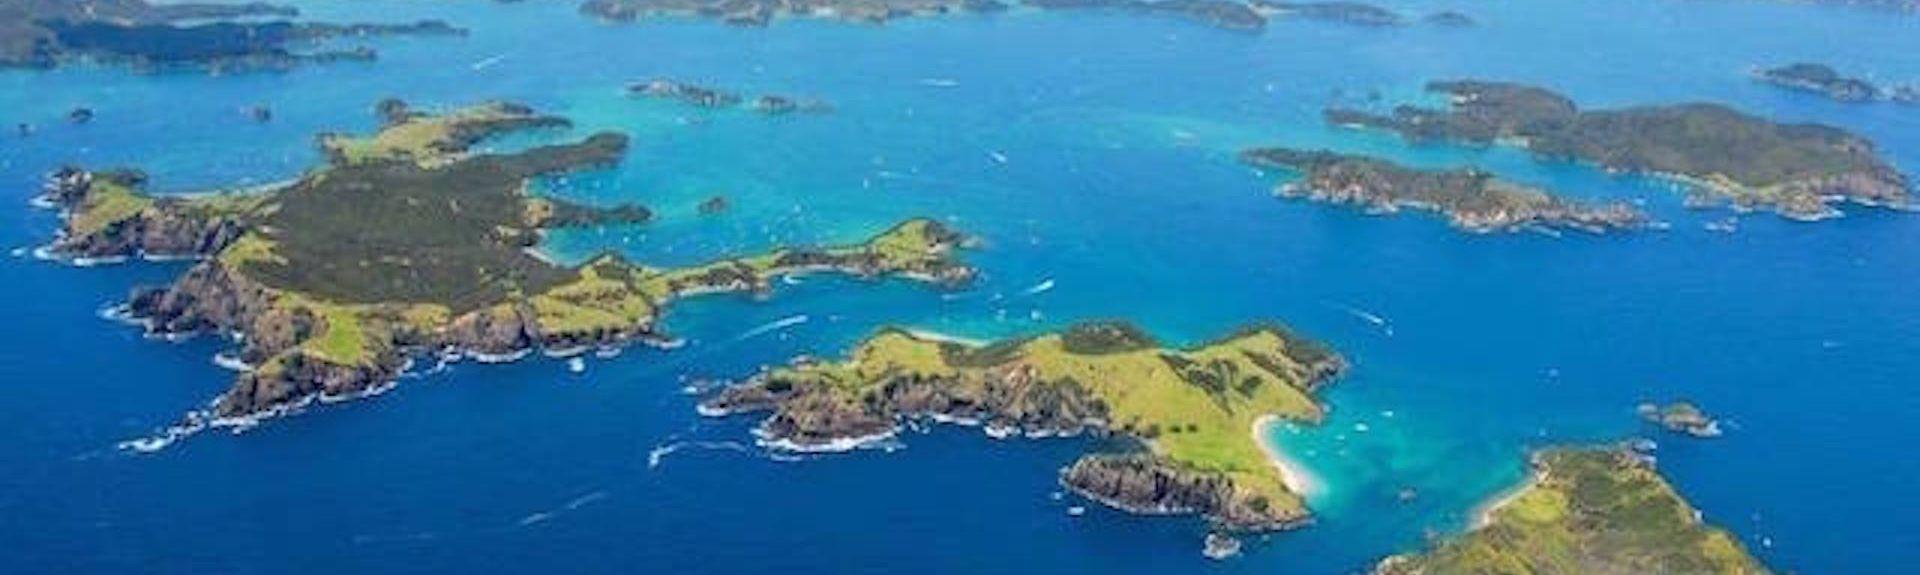 Paihia, Far North, Northland, New Zealand